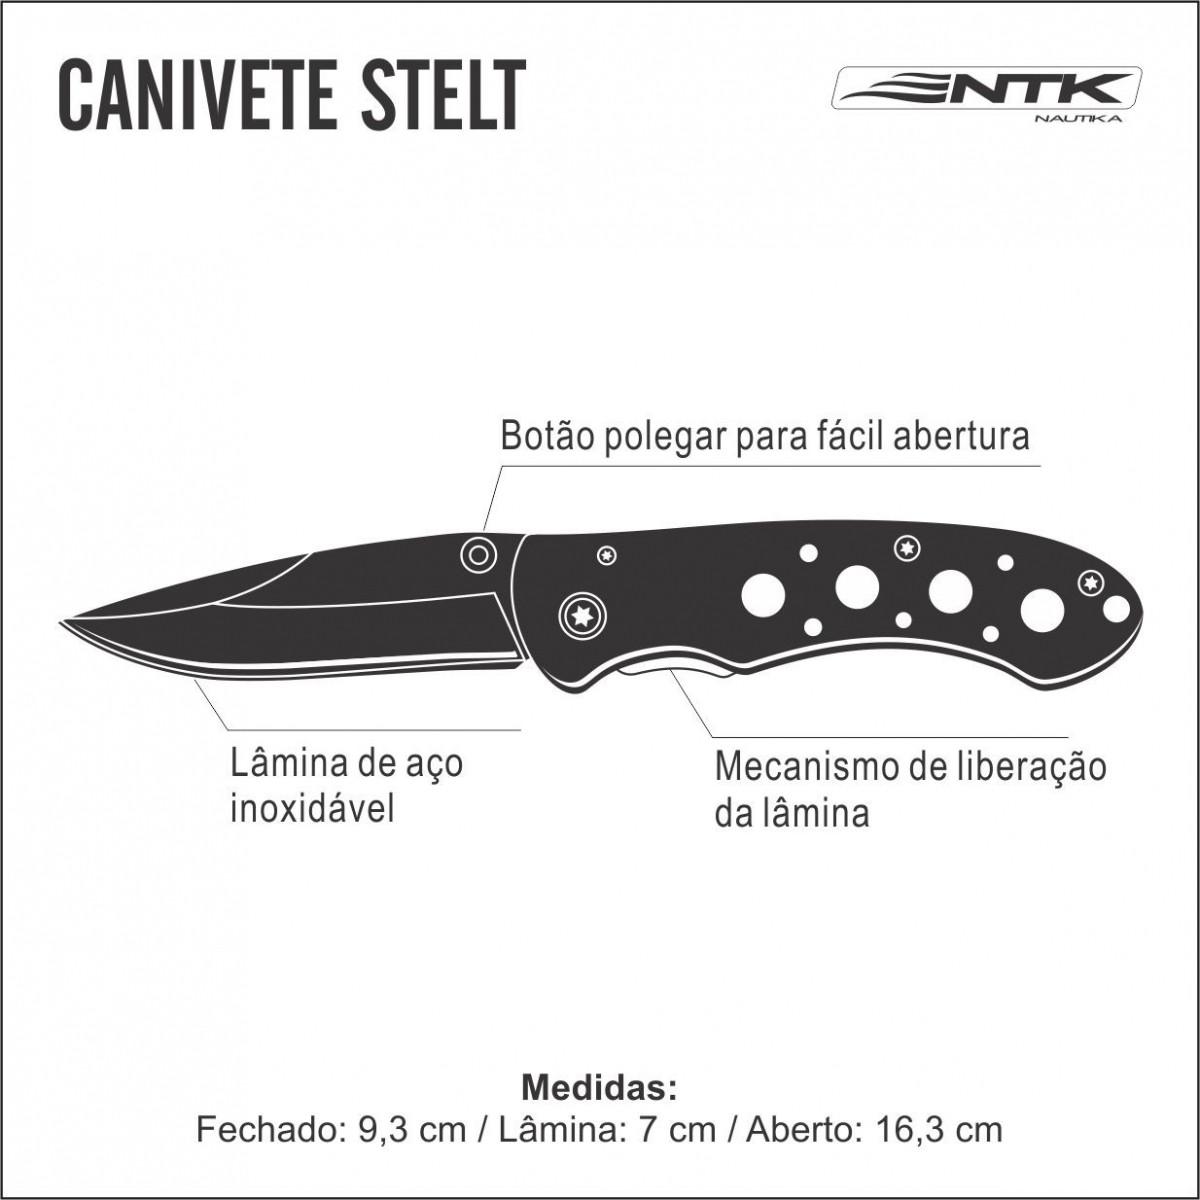 Canivete Ntk Stelt Pesca Caça Trilha Camping Aventura Inox - Nautika